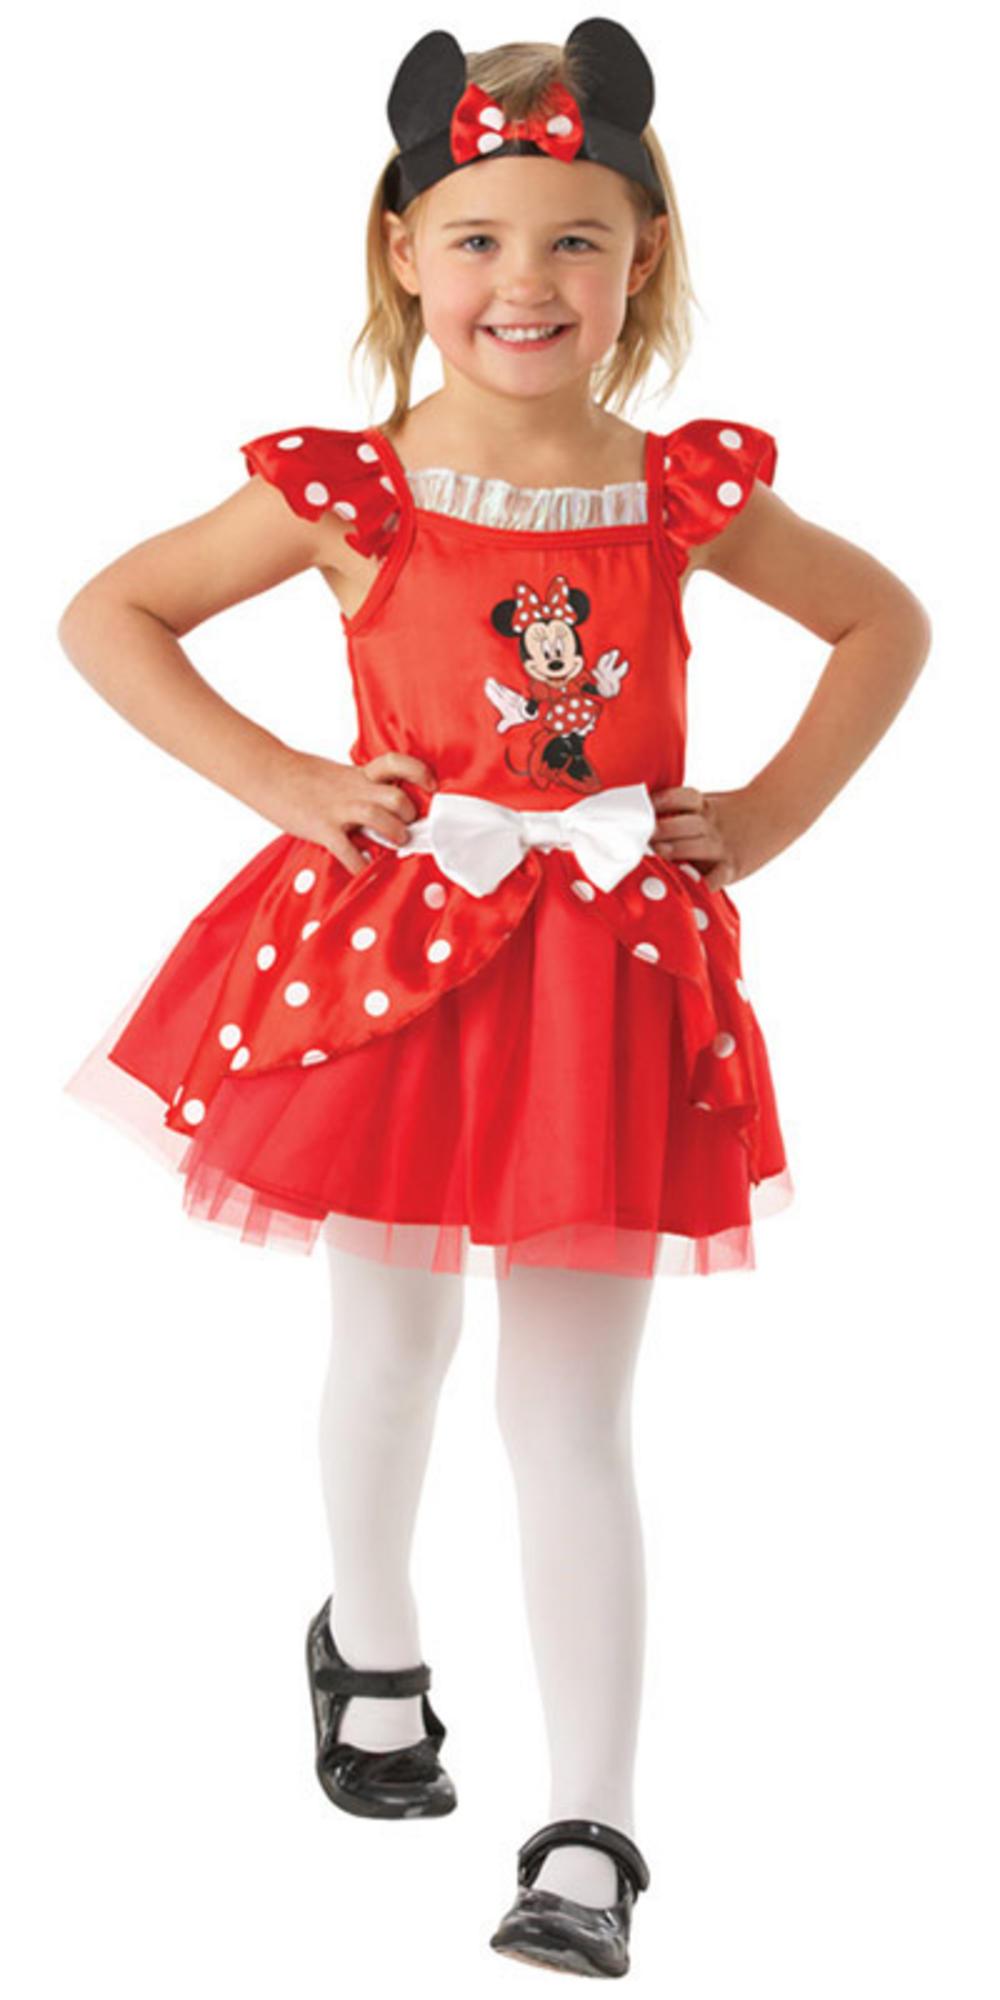 disney minnie mouse ballerina cartoon character girls fancy dress halloween costume. Black Bedroom Furniture Sets. Home Design Ideas